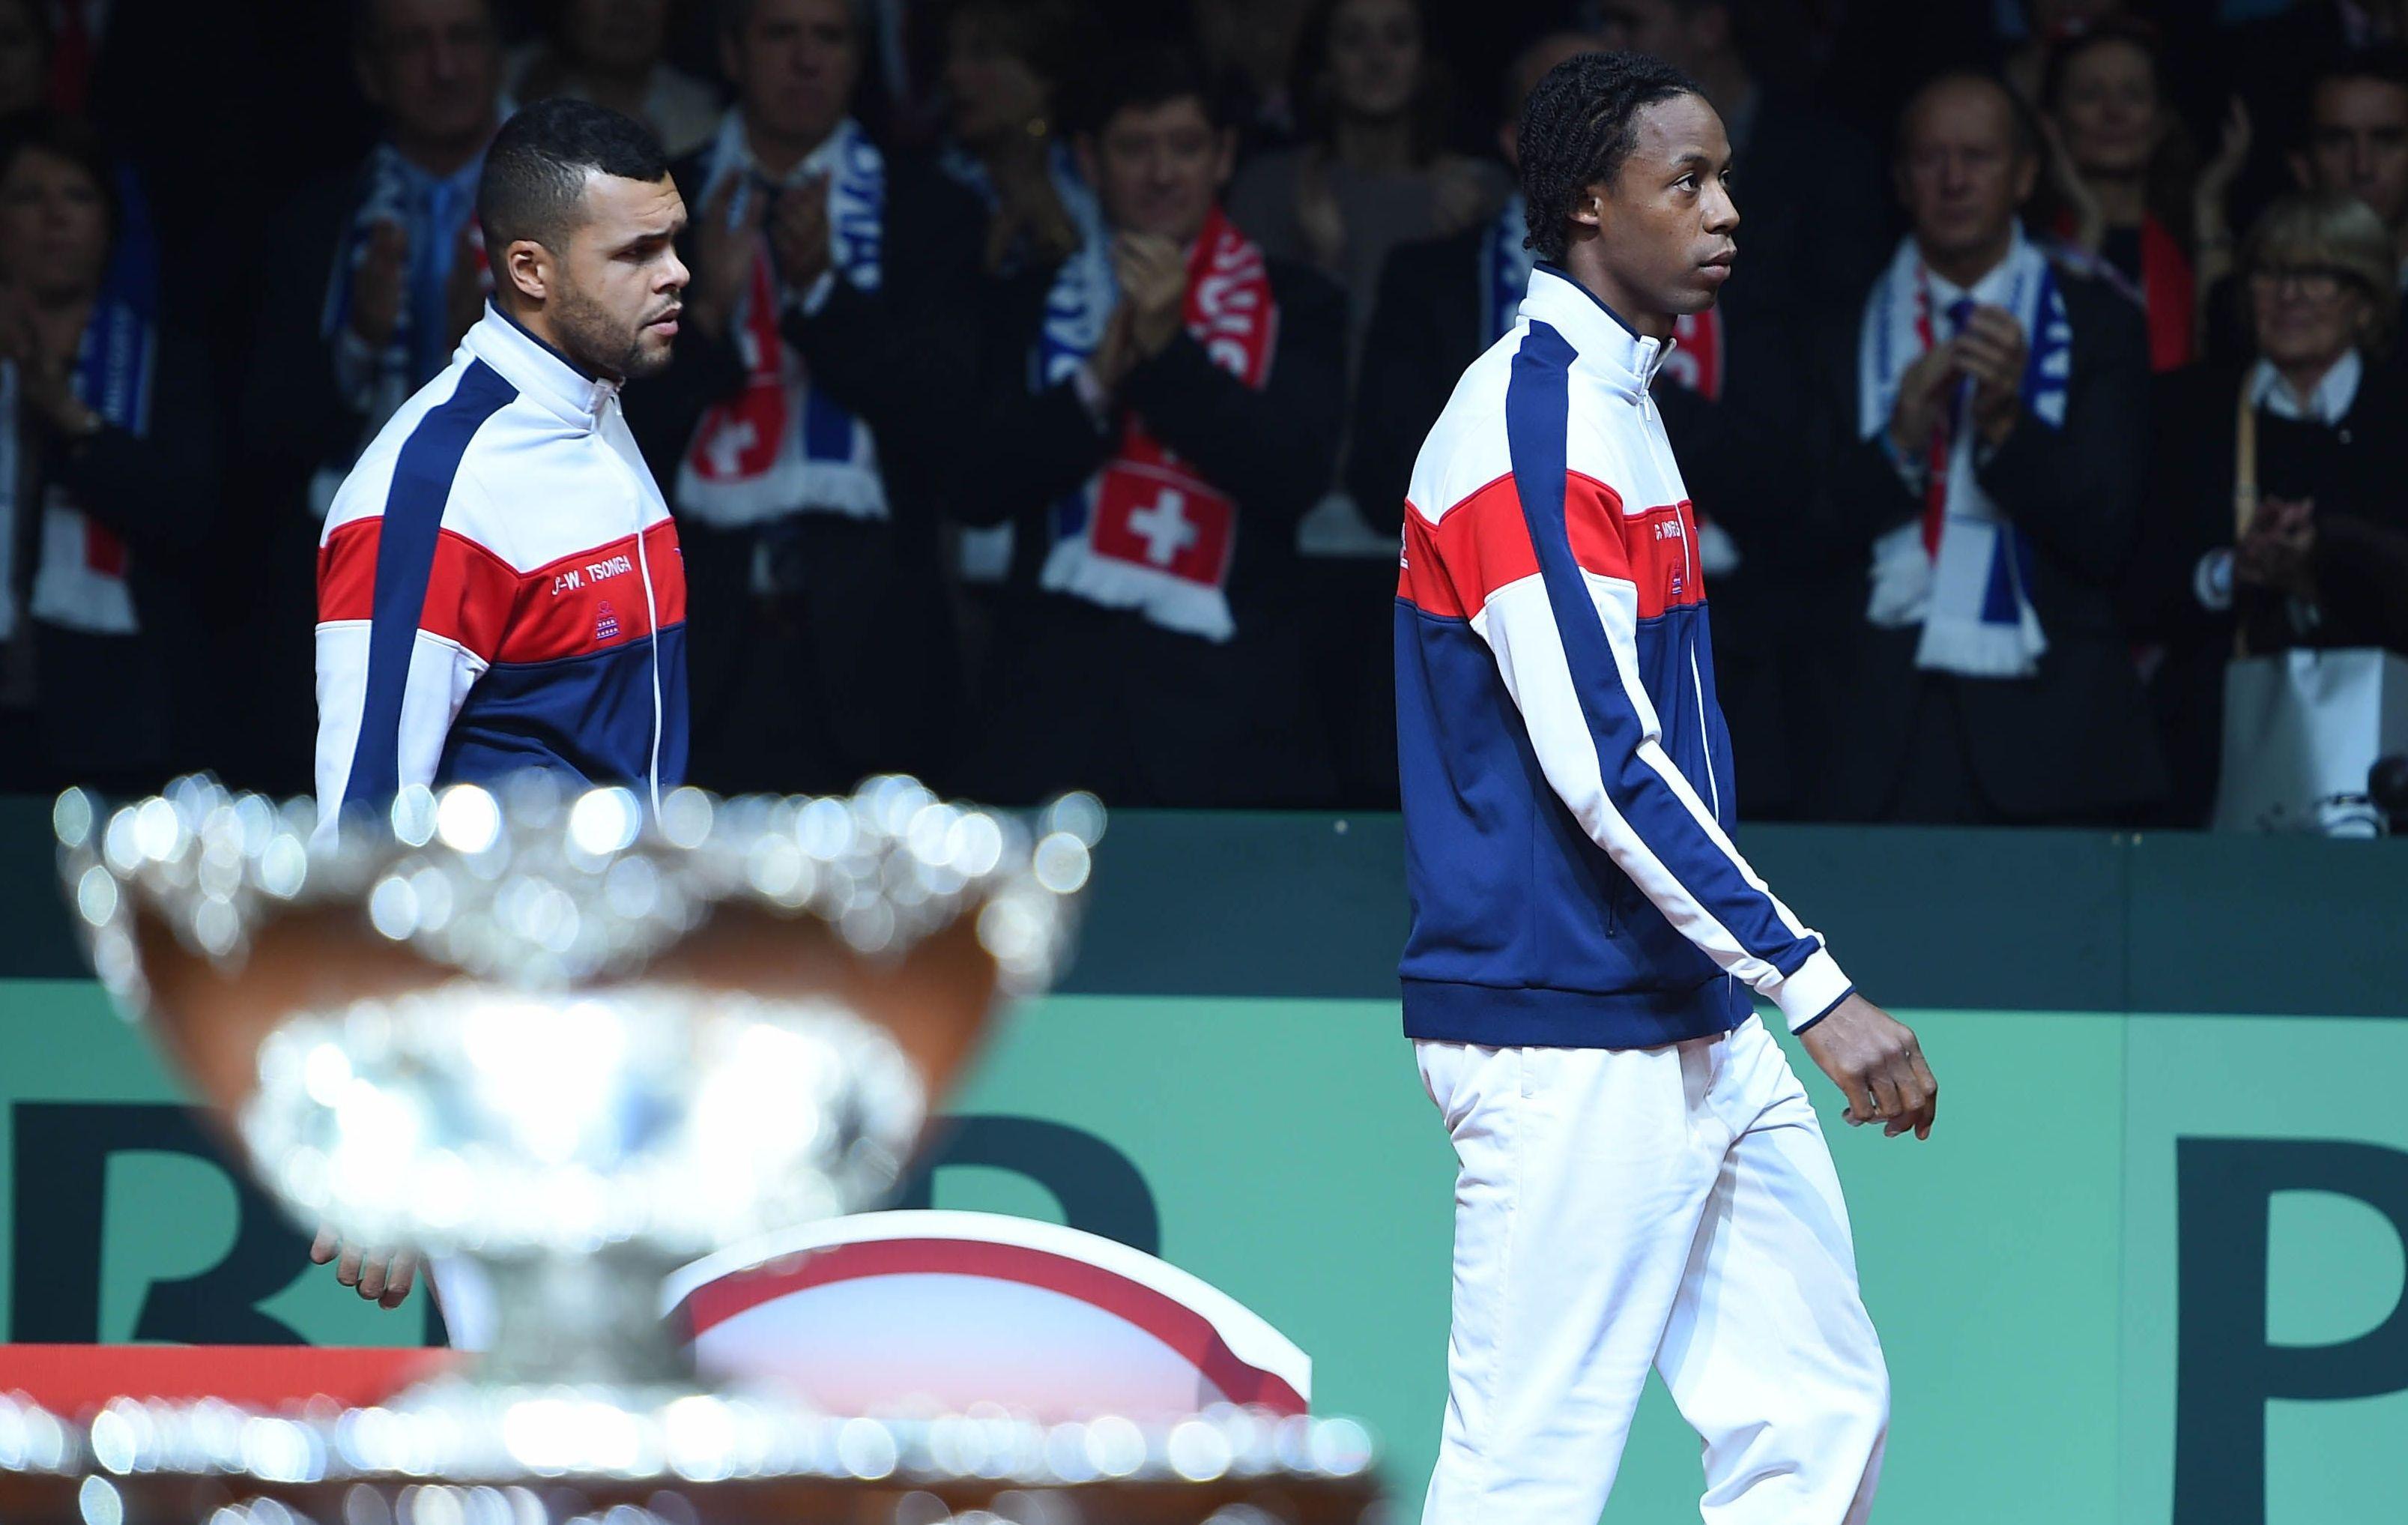 Tennis : Coupe Davis - Tsonga entrouvre la porte � Noah